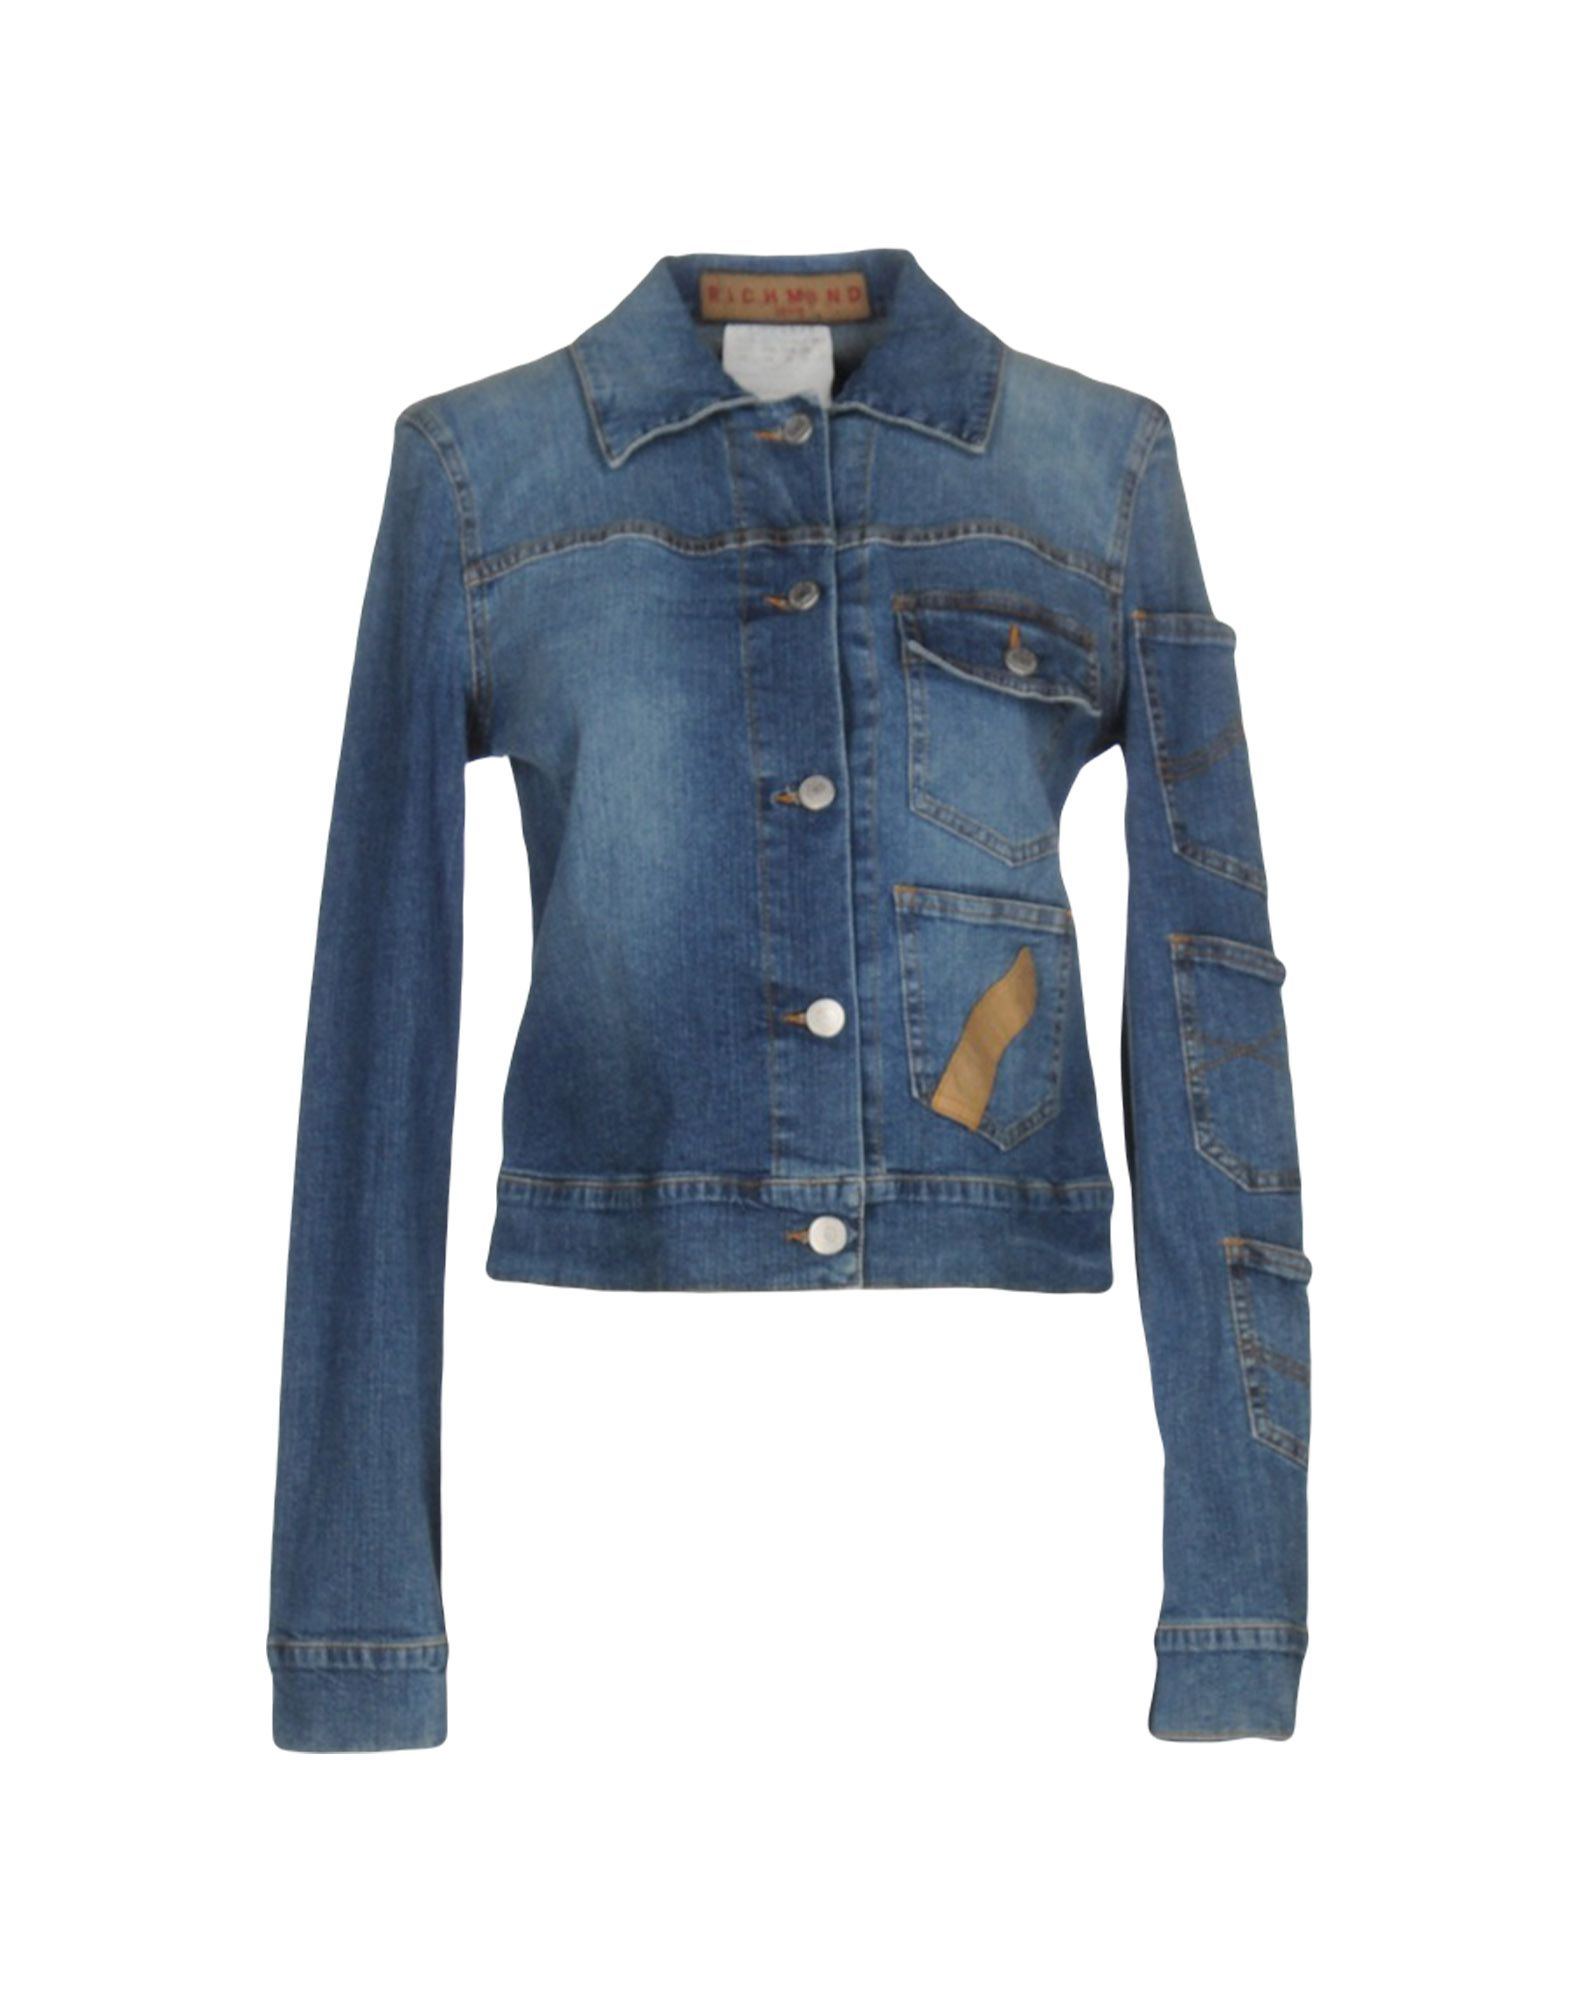 richmond джинсовая верхняя одежда RICHMOND DENIM Джинсовая верхняя одежда